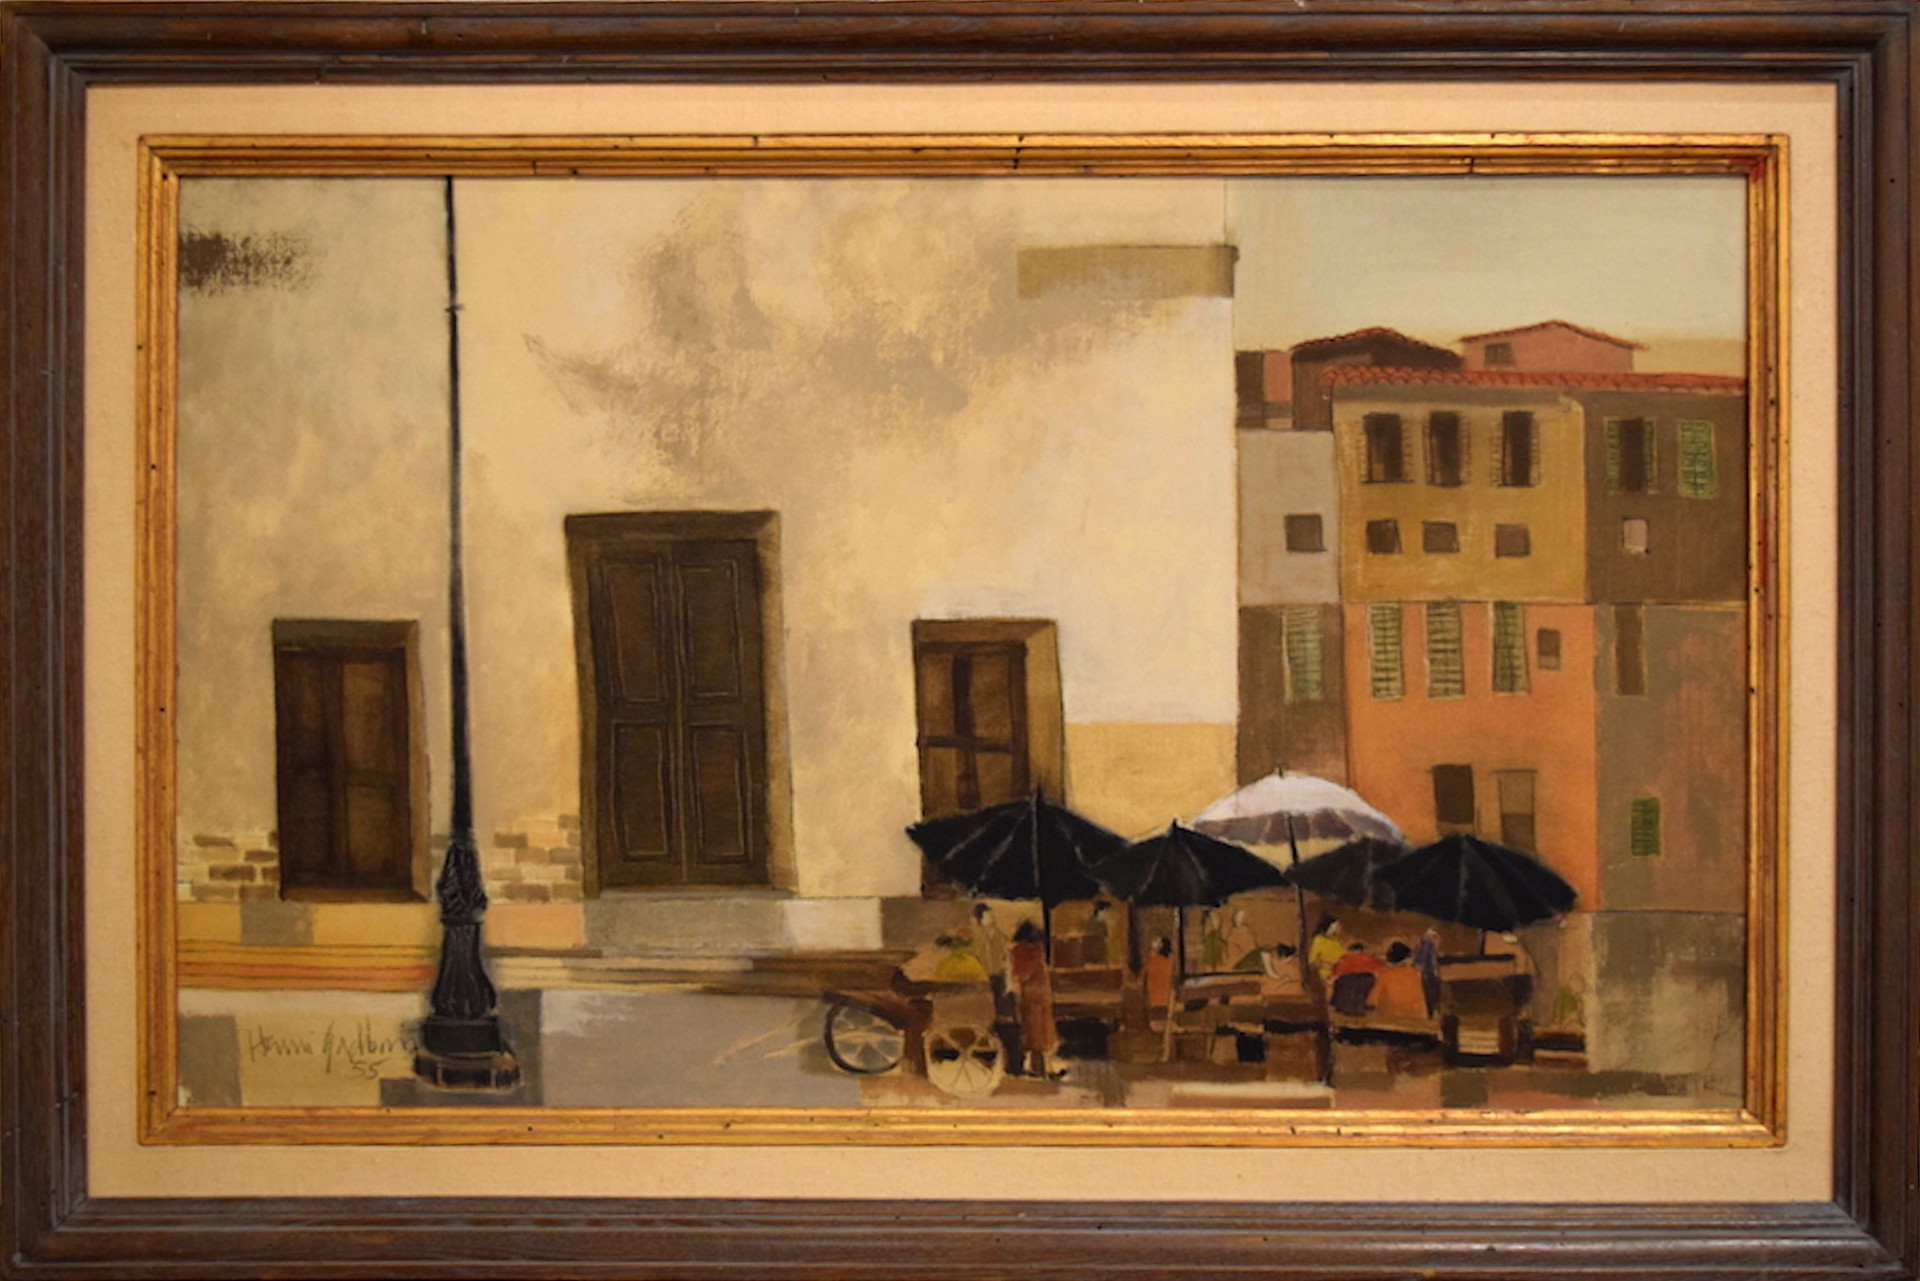 Rothenberg by Henri Gadbois